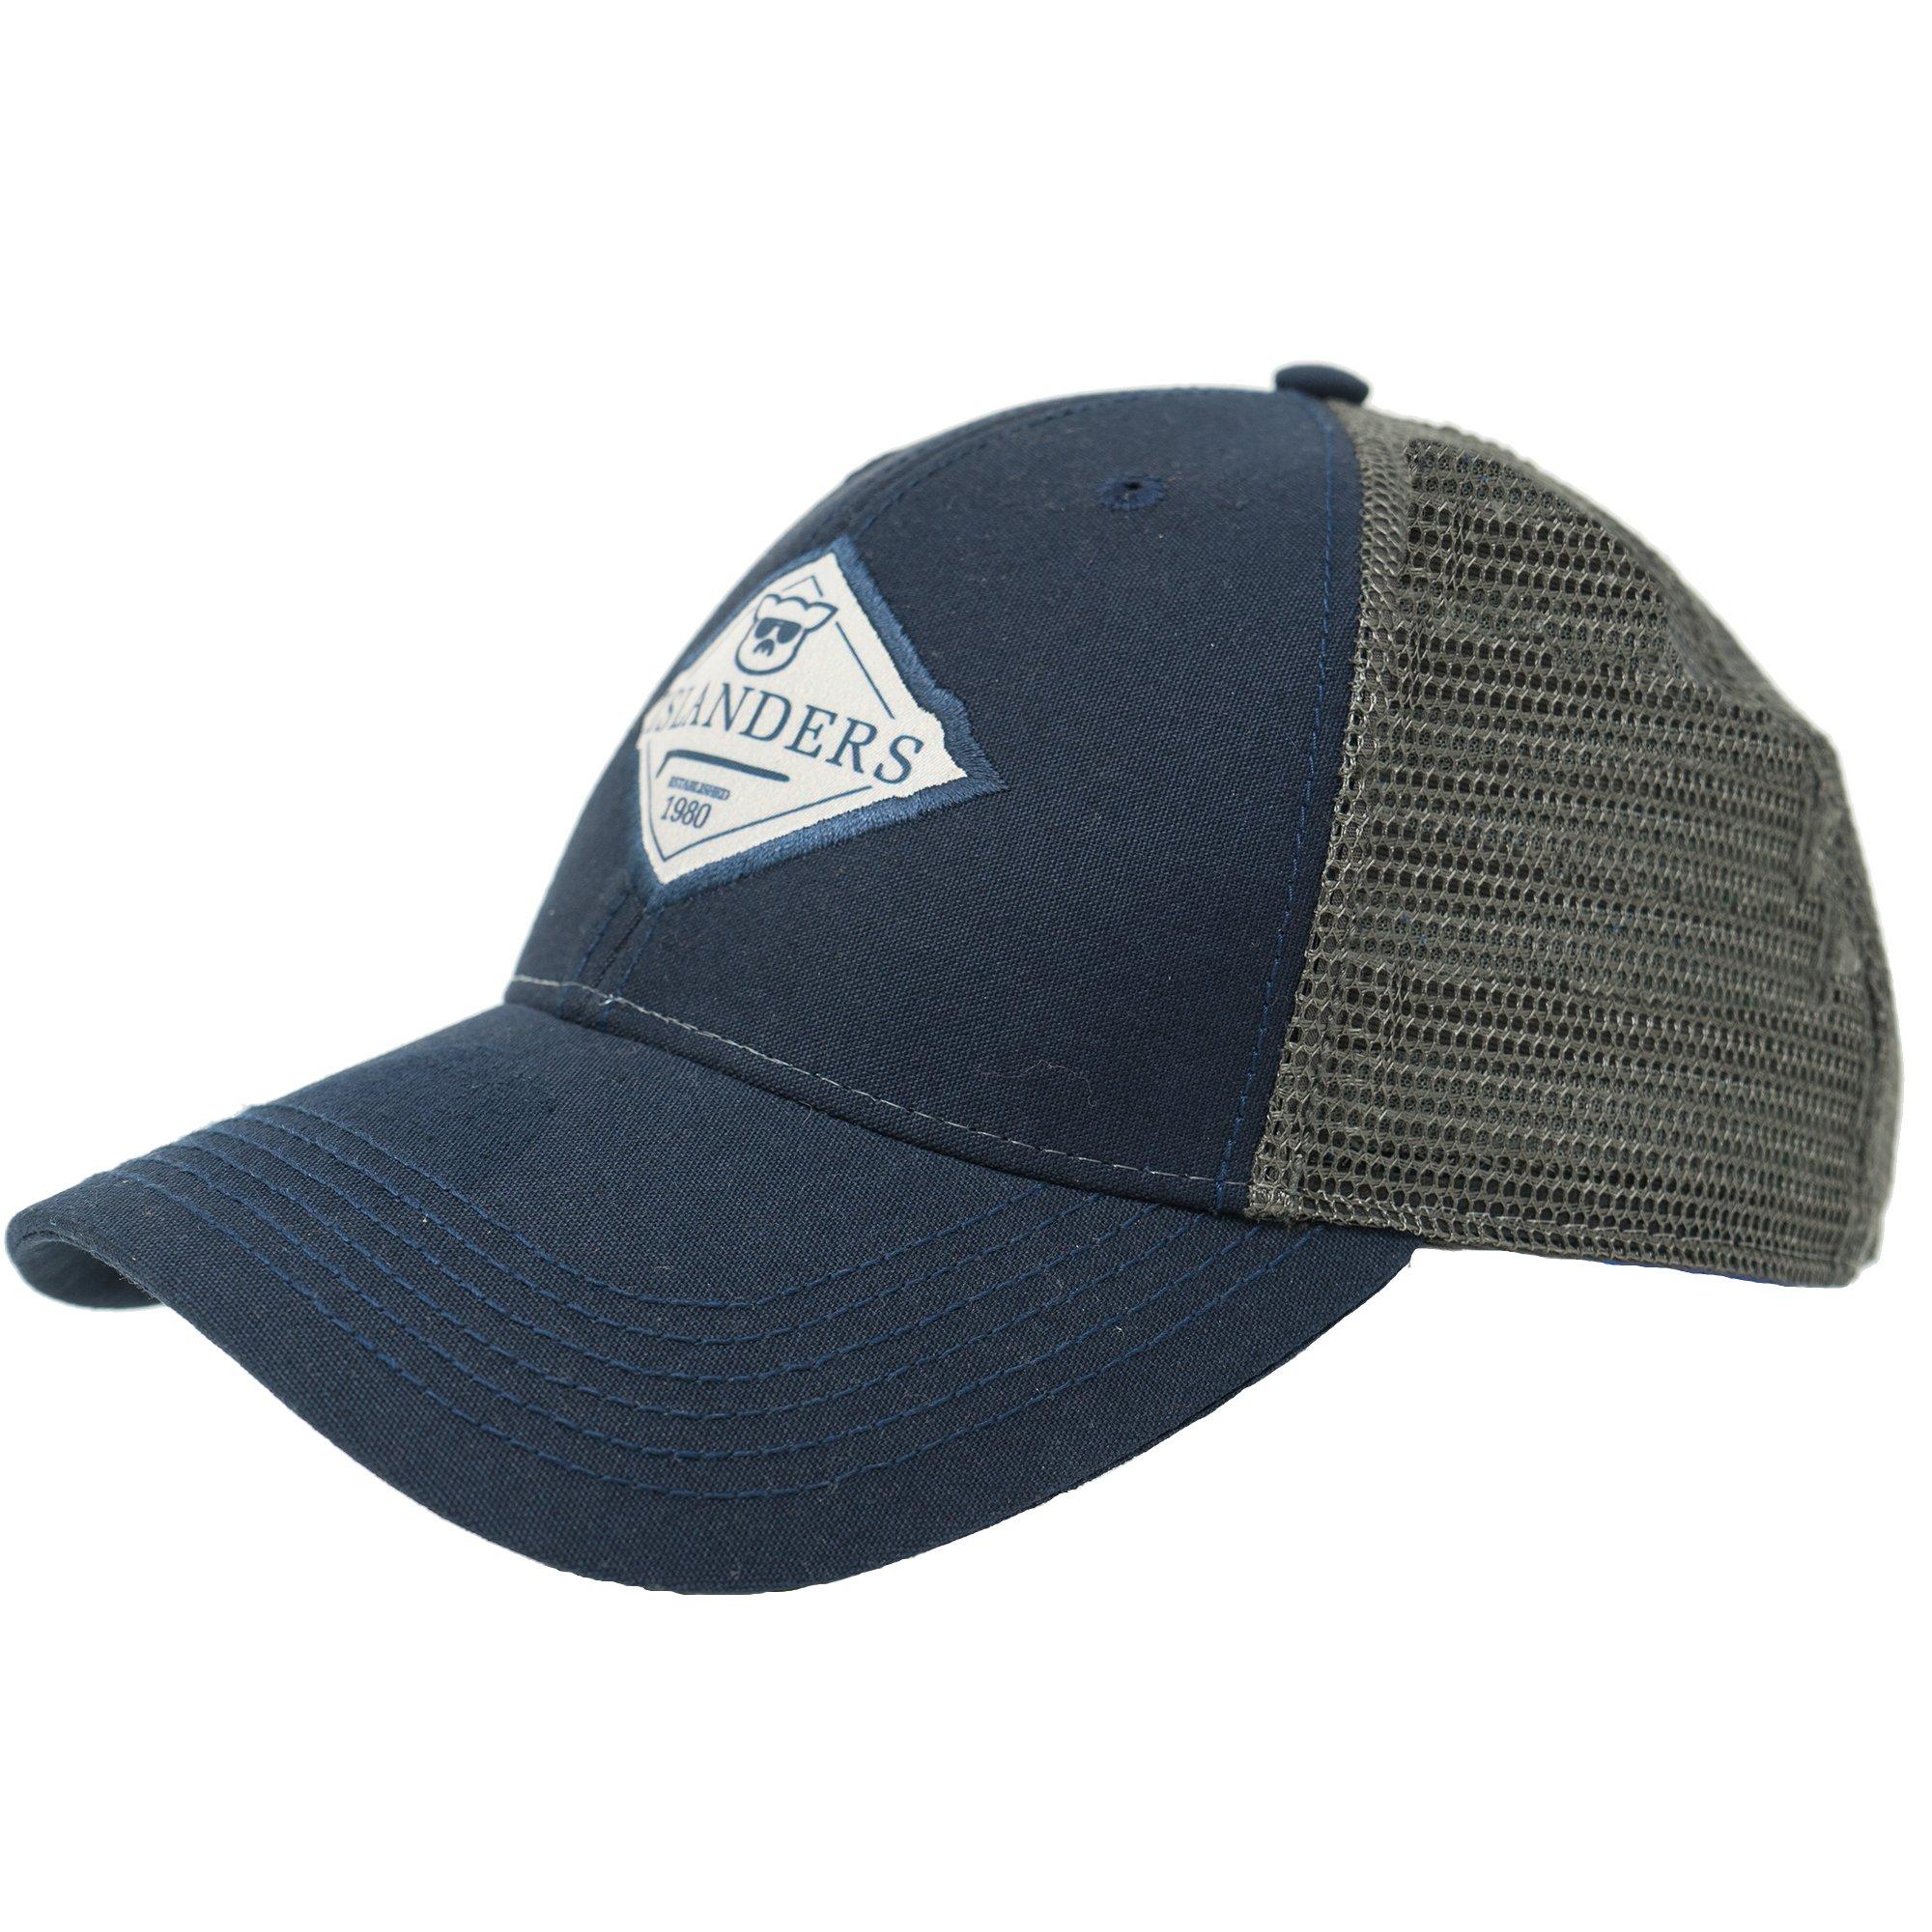 923ed387146182 Islanders Diamond Patch Trucker, Navy/Grey, One Size